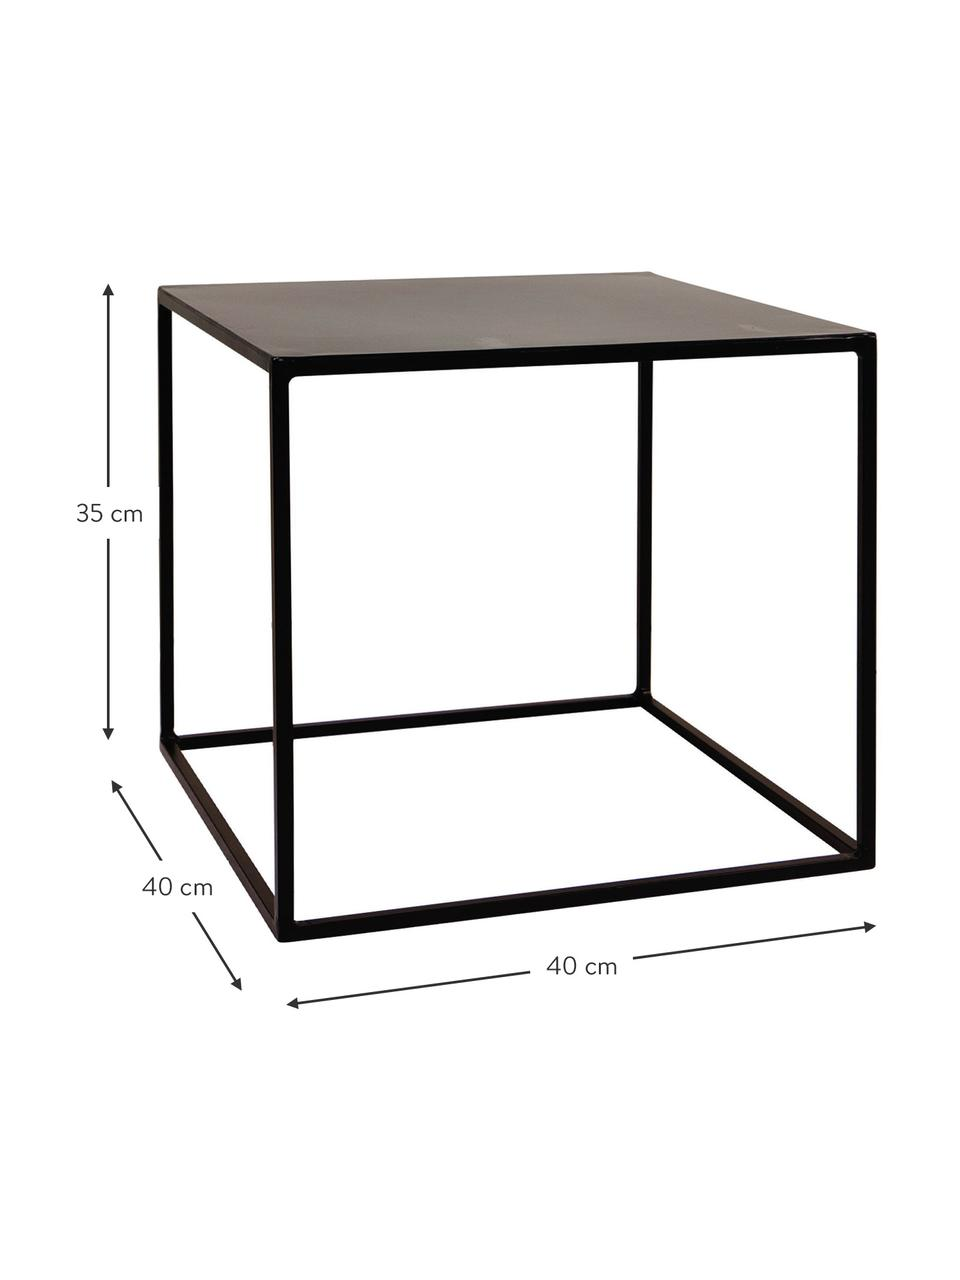 Beistelltisch Expo aus Metall, Metall, pulverbeschichtet, Schwarz, B 40 x T 40 cm